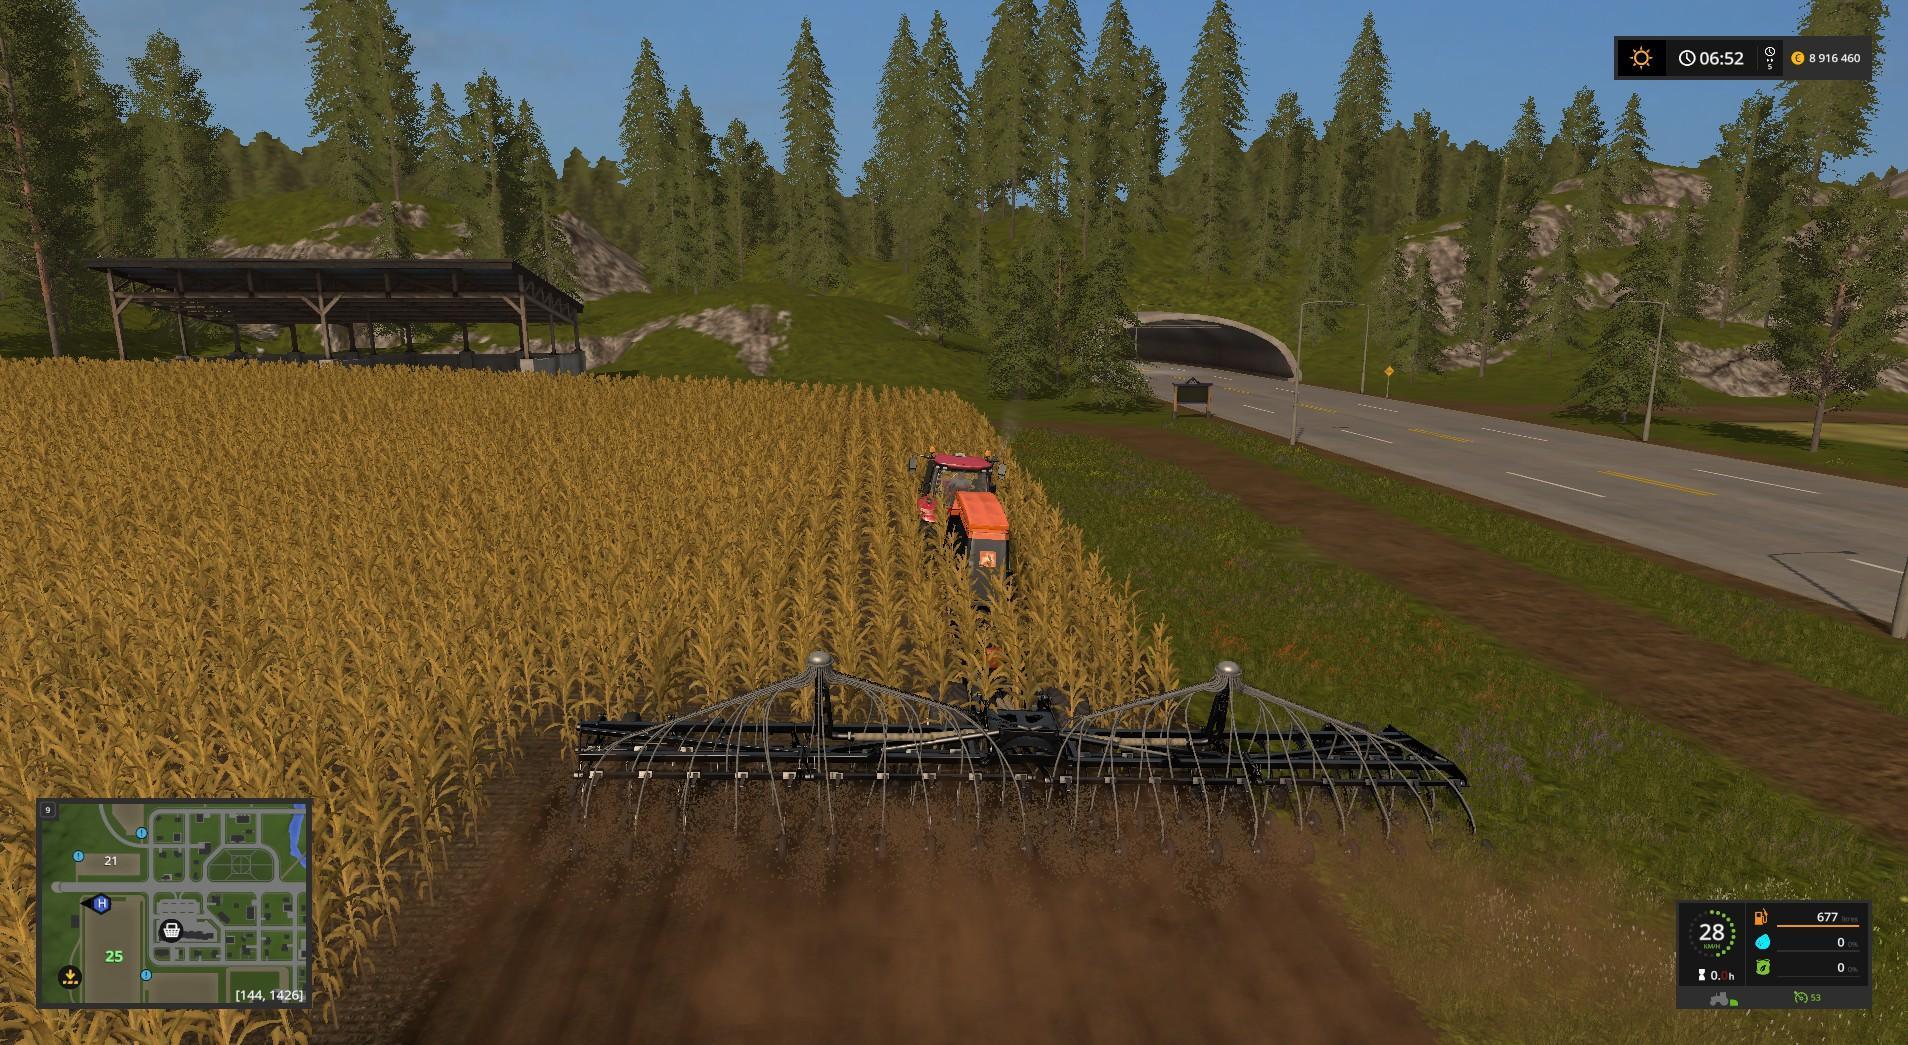 Мод сеялка AMAZONE CONDOR 15001 DIRECTSEED V2.0.0 Farming Simulator 17